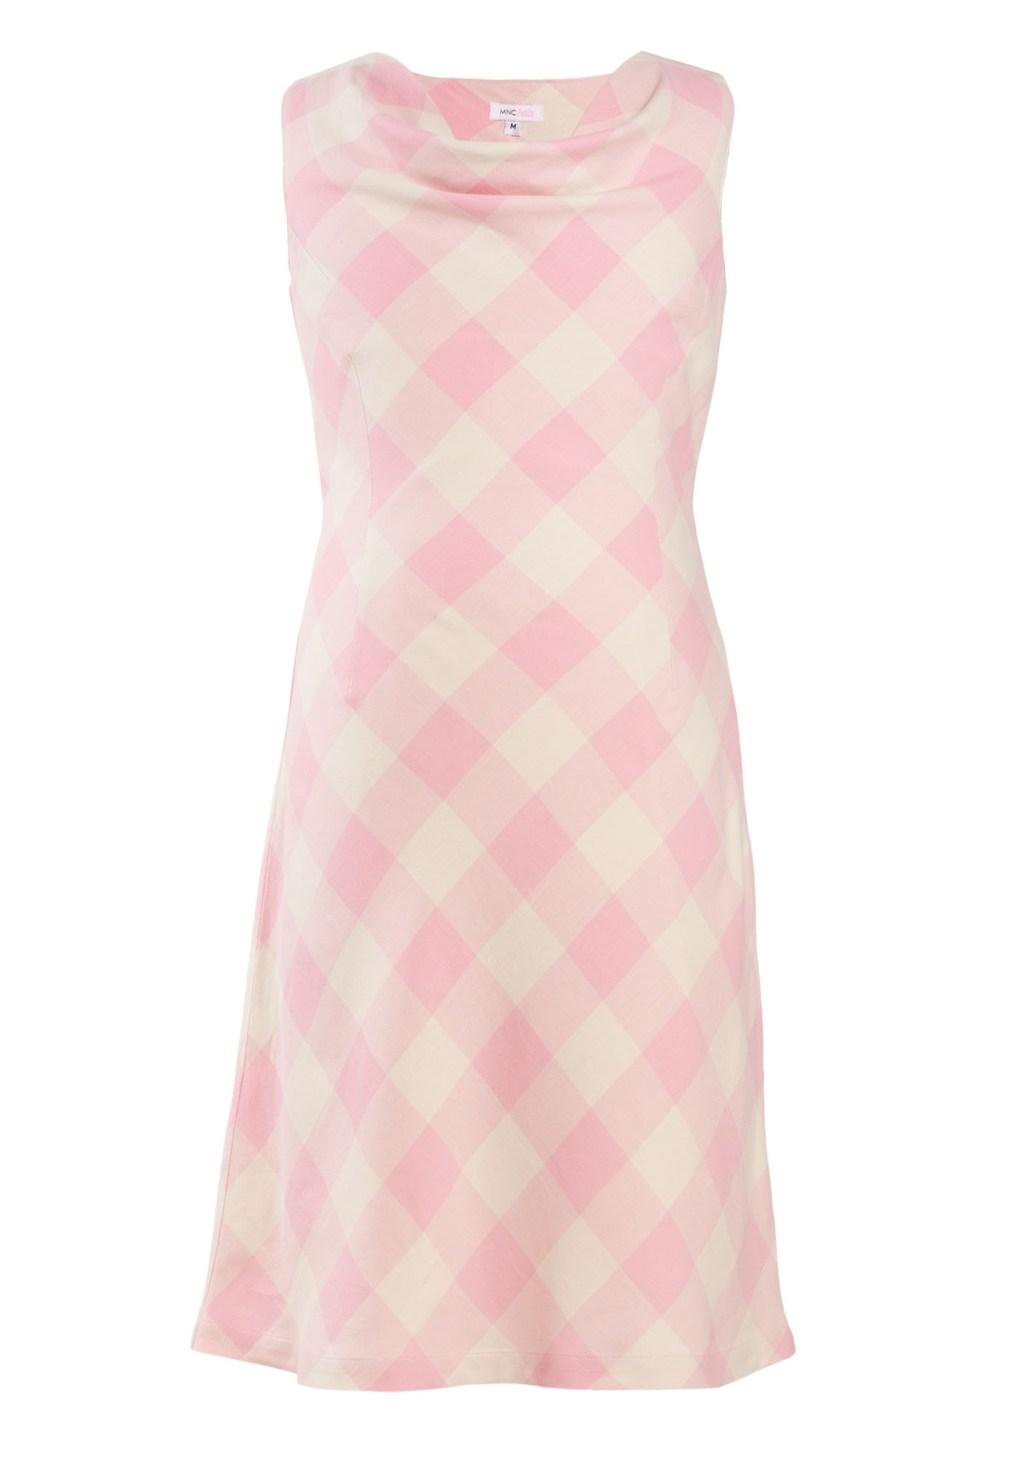 MINC Petite Girls Cowl Neck Dress in Yarn Dyed Cotton Checks